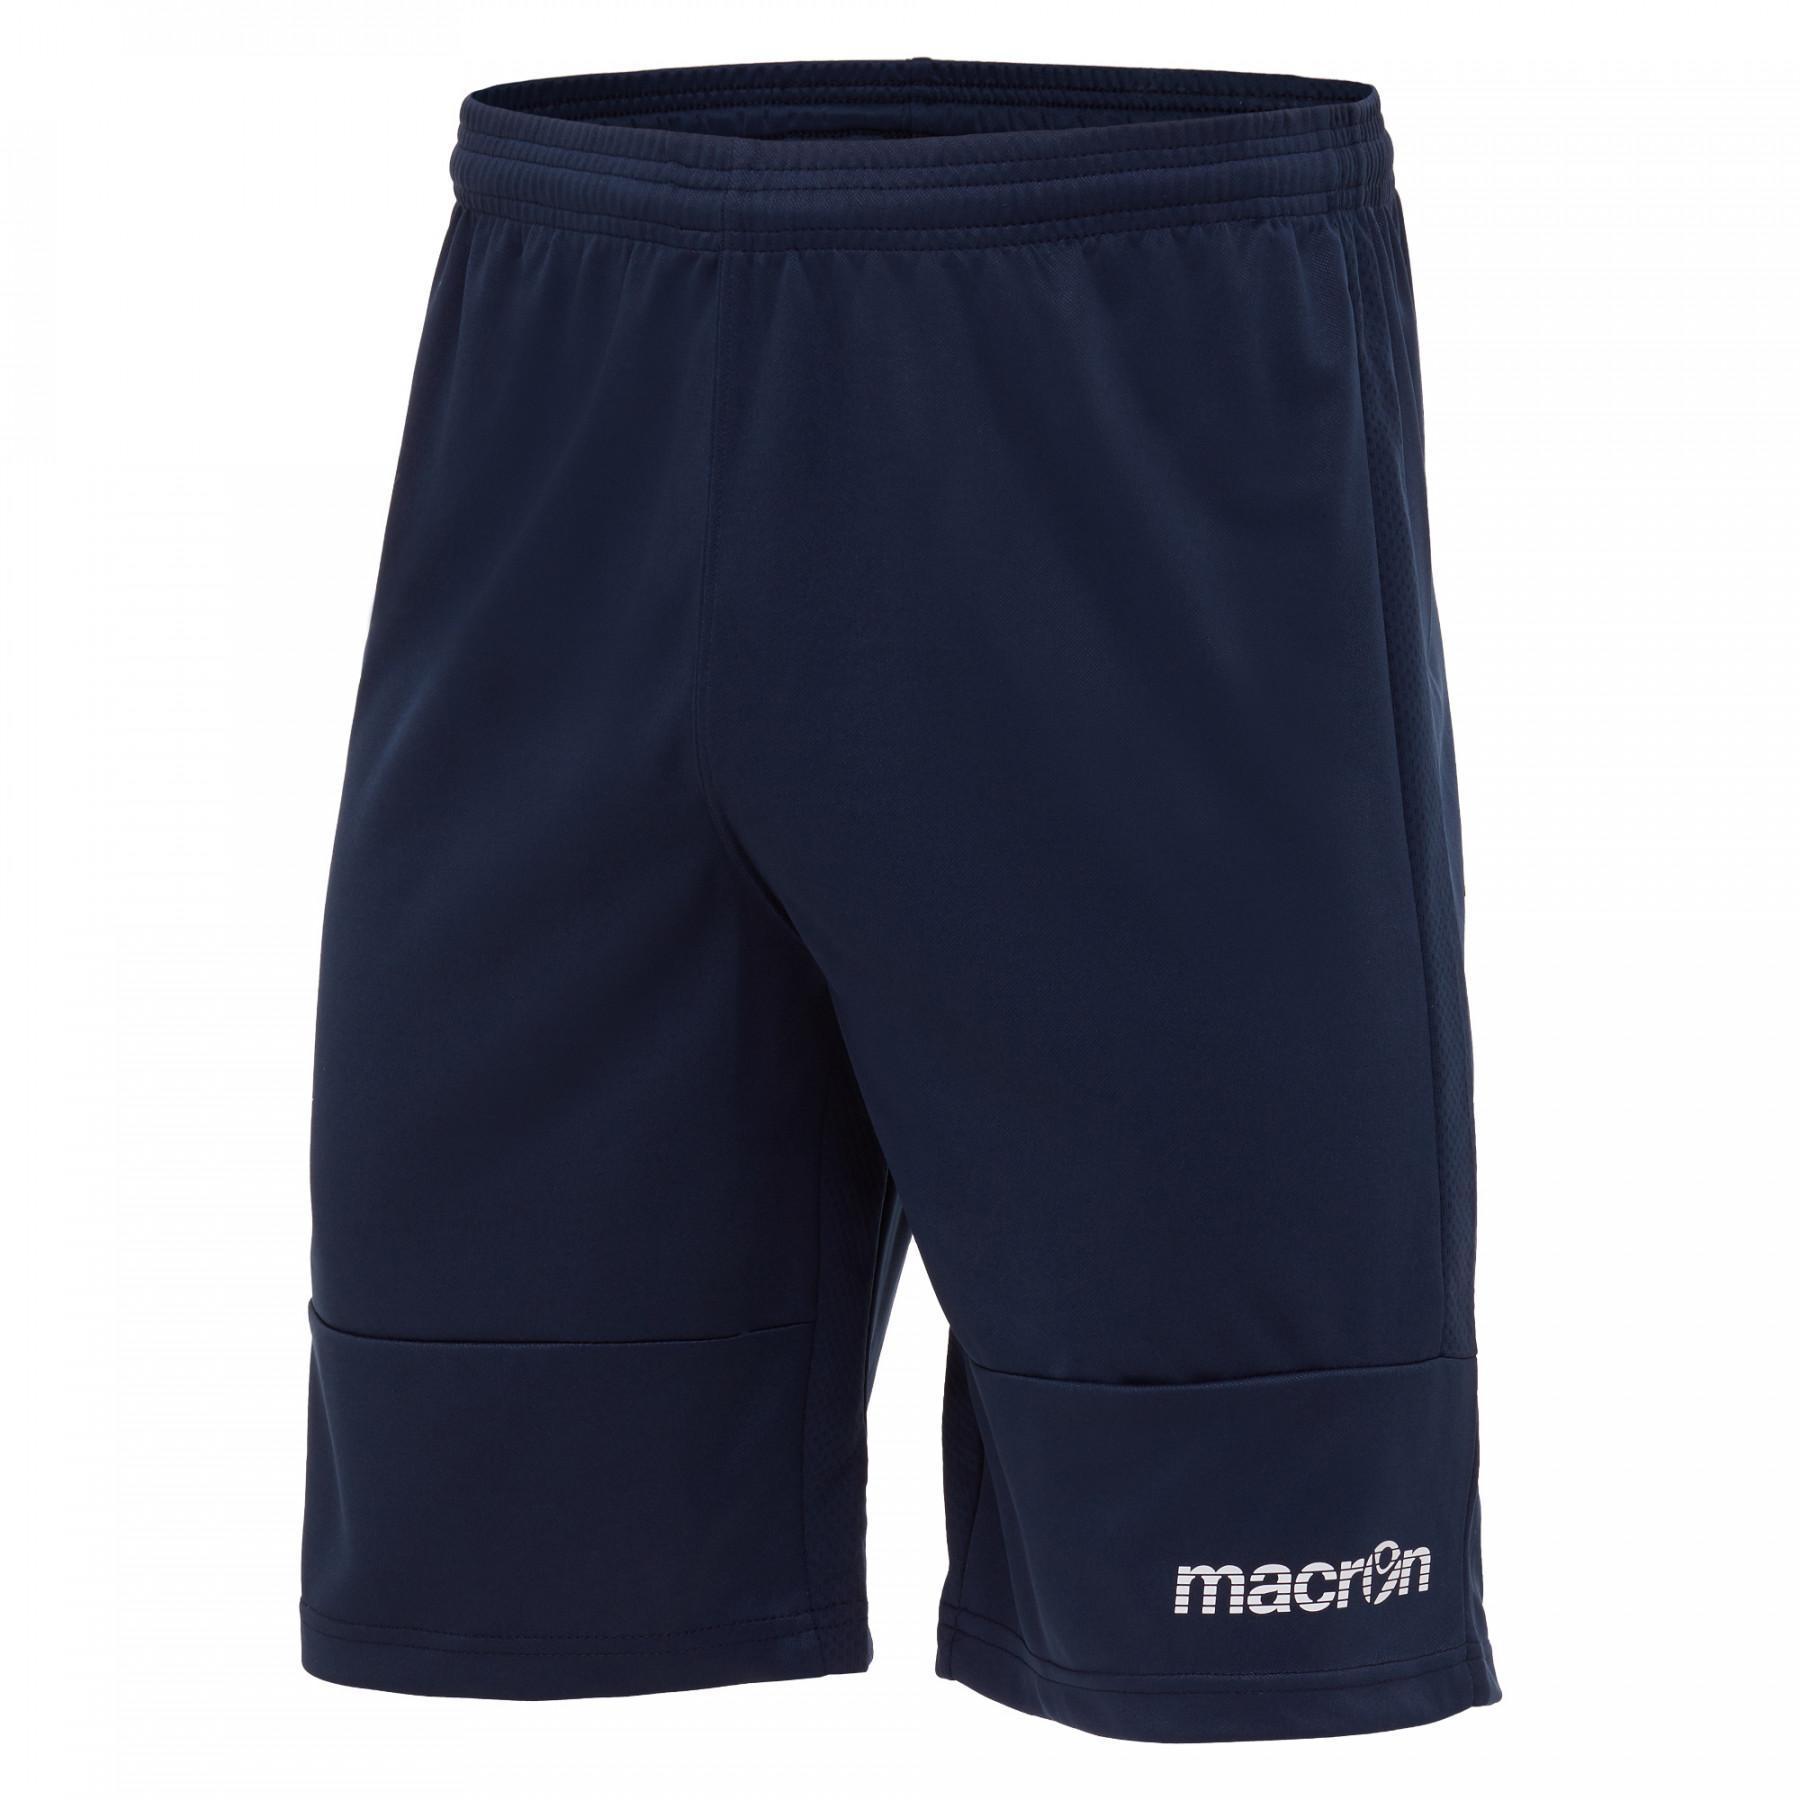 Bermuda shorts Macron kura